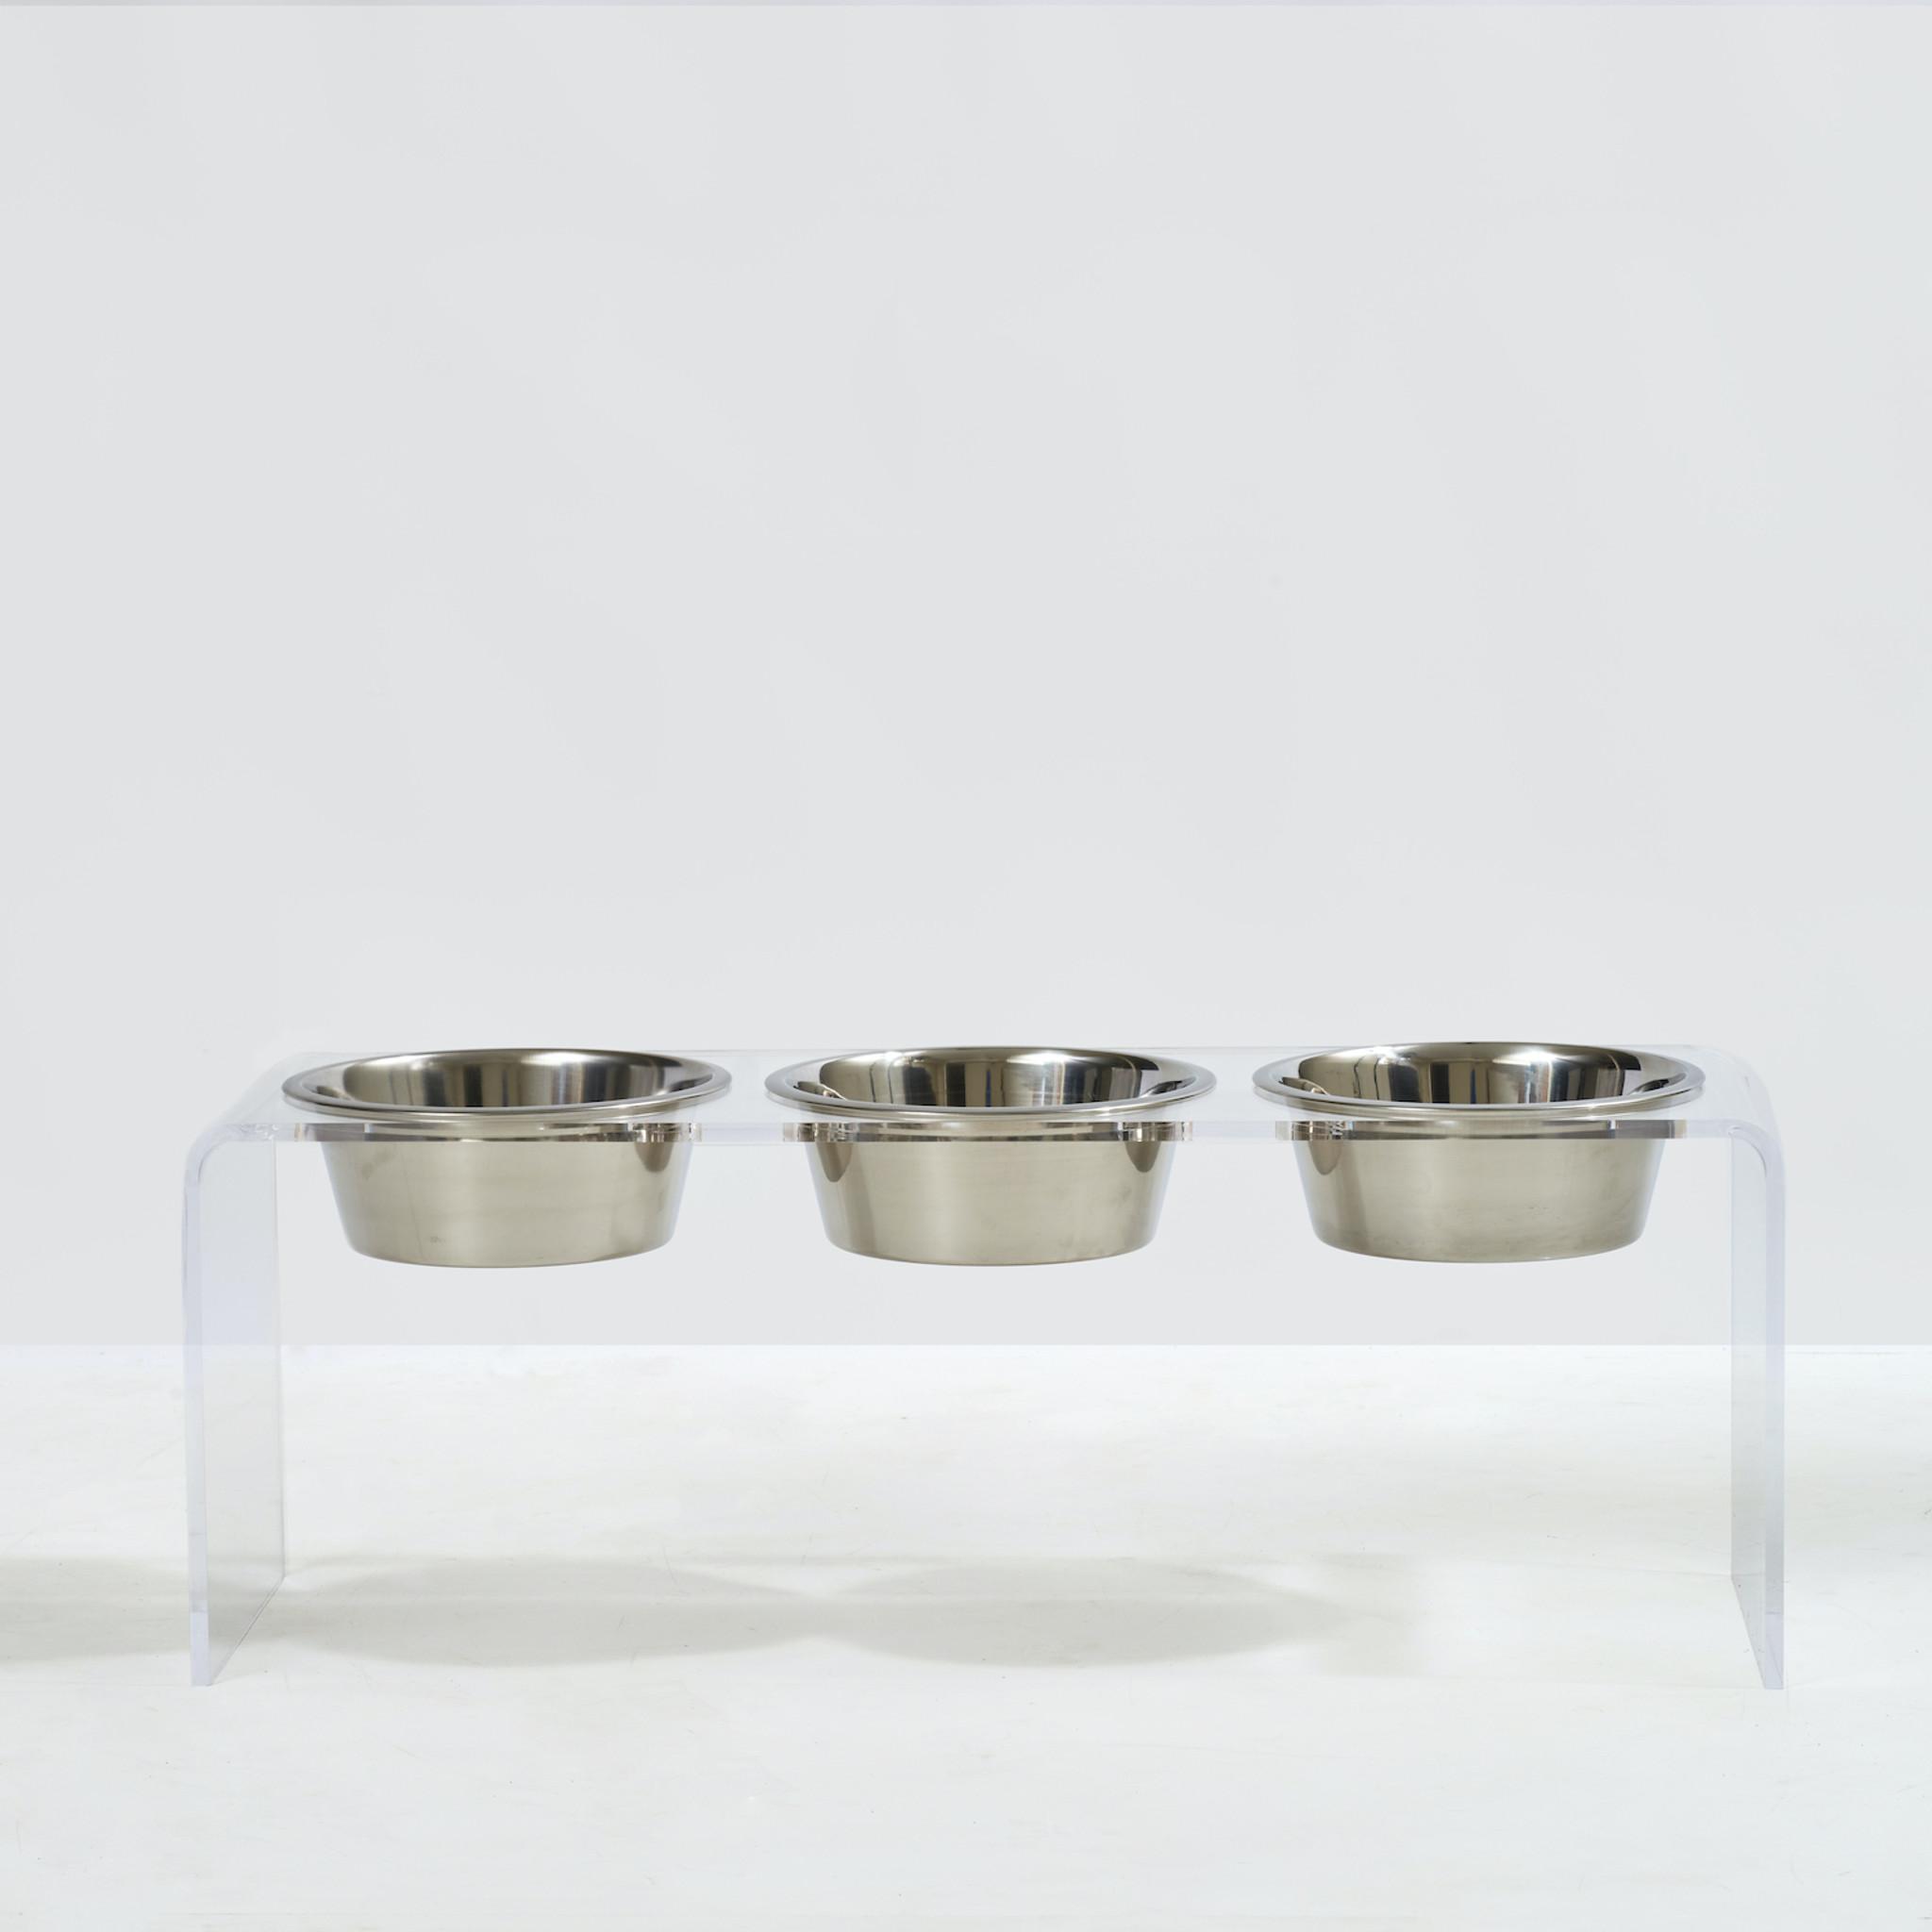 Tall Clear Acrylic Triple Bowl Feeder by Hiddin